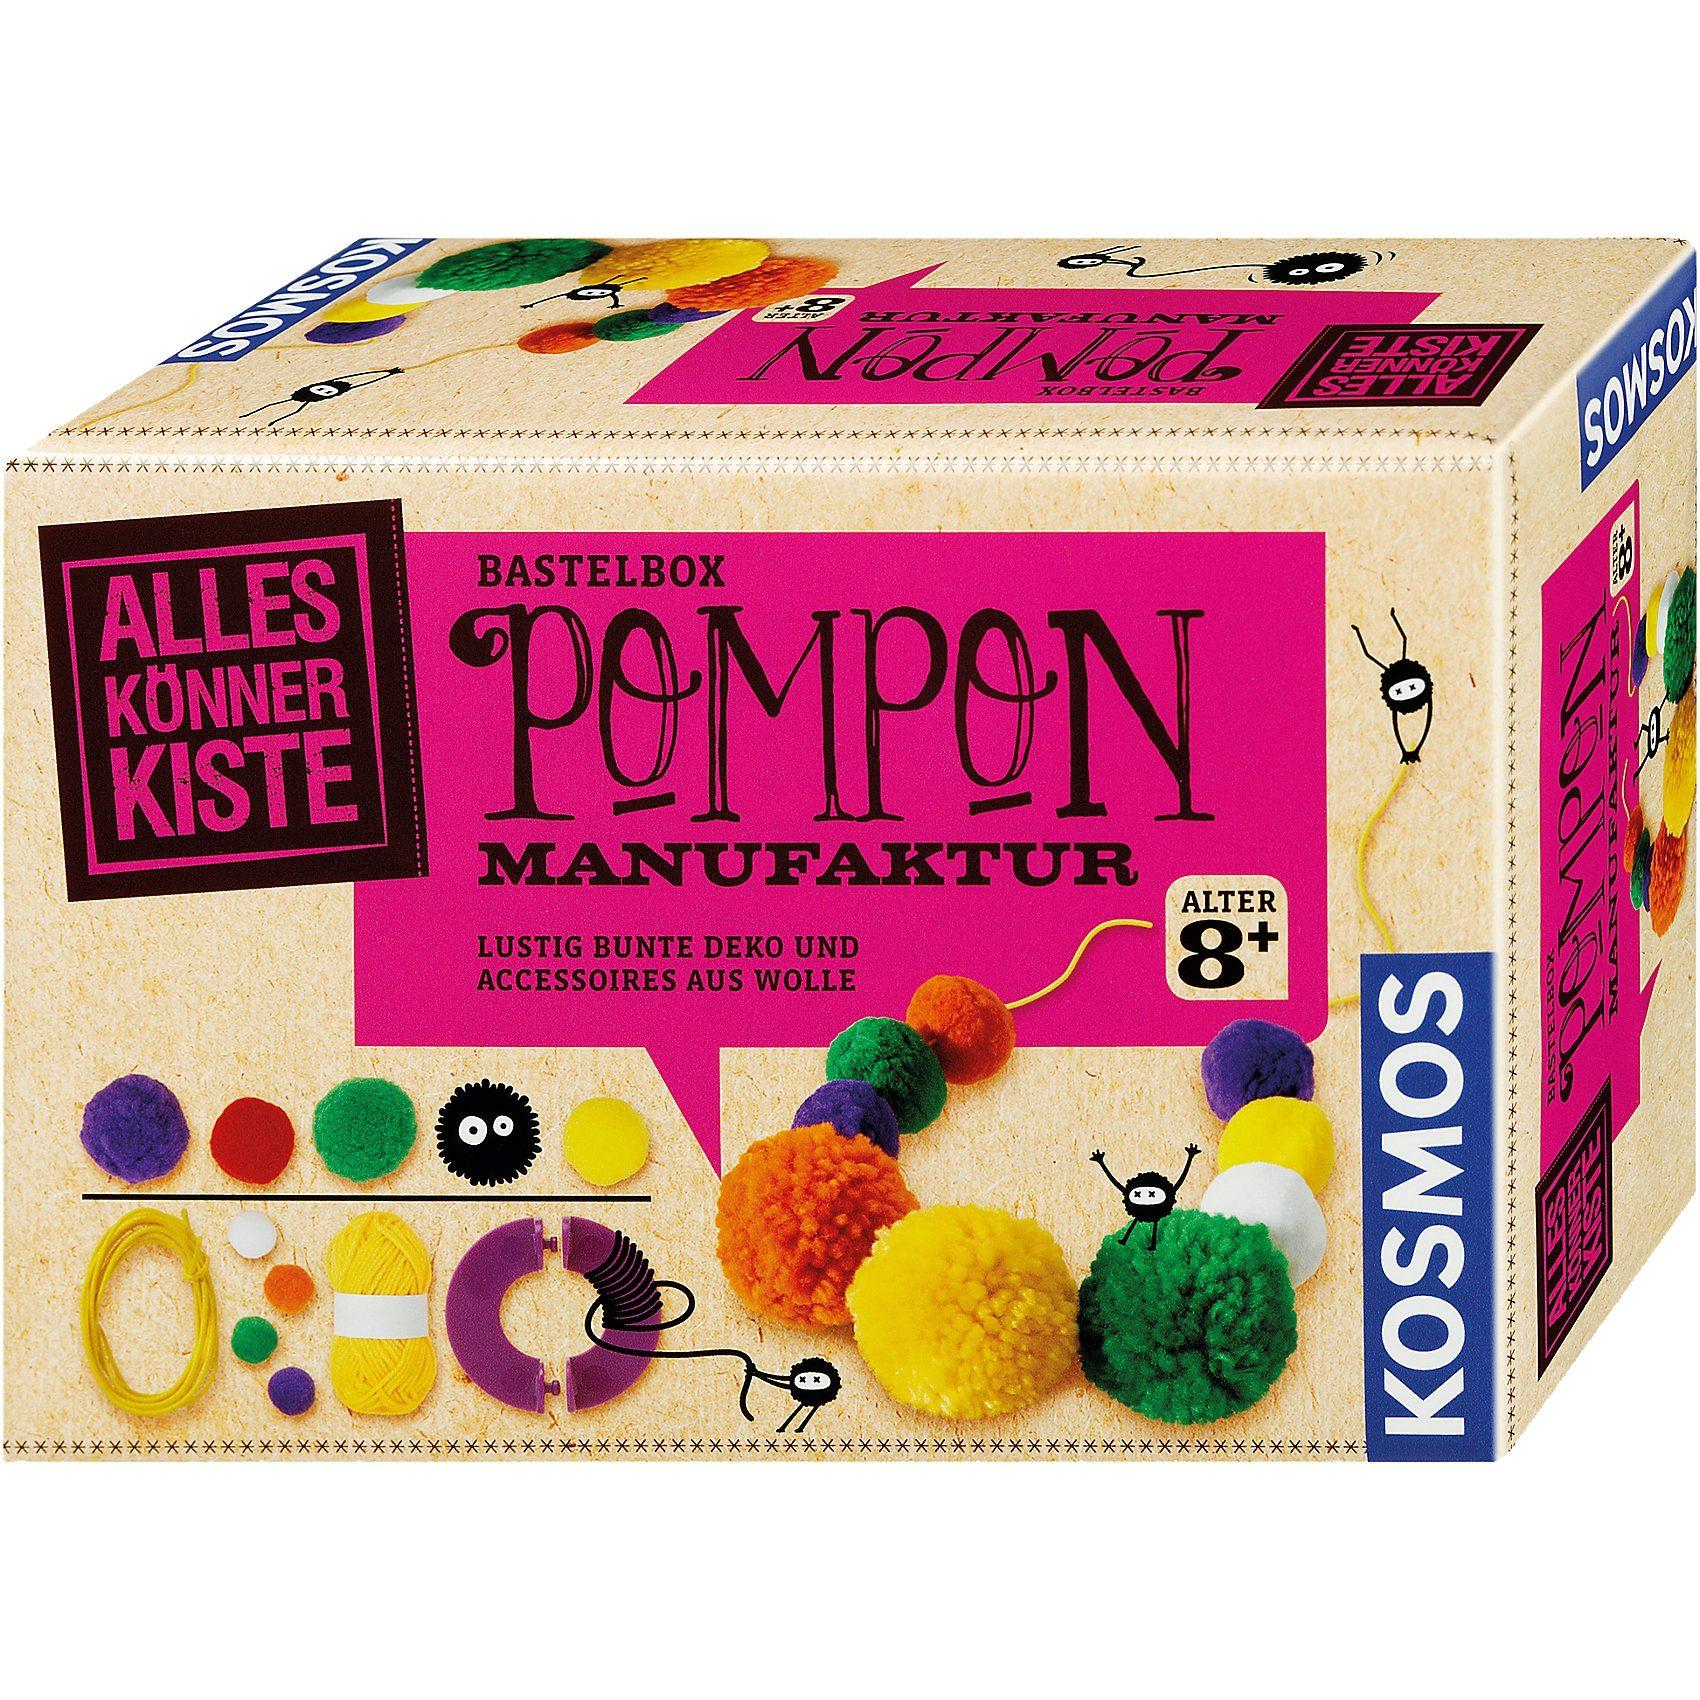 Kosmos Bastelbox Pompon-Manufaktur